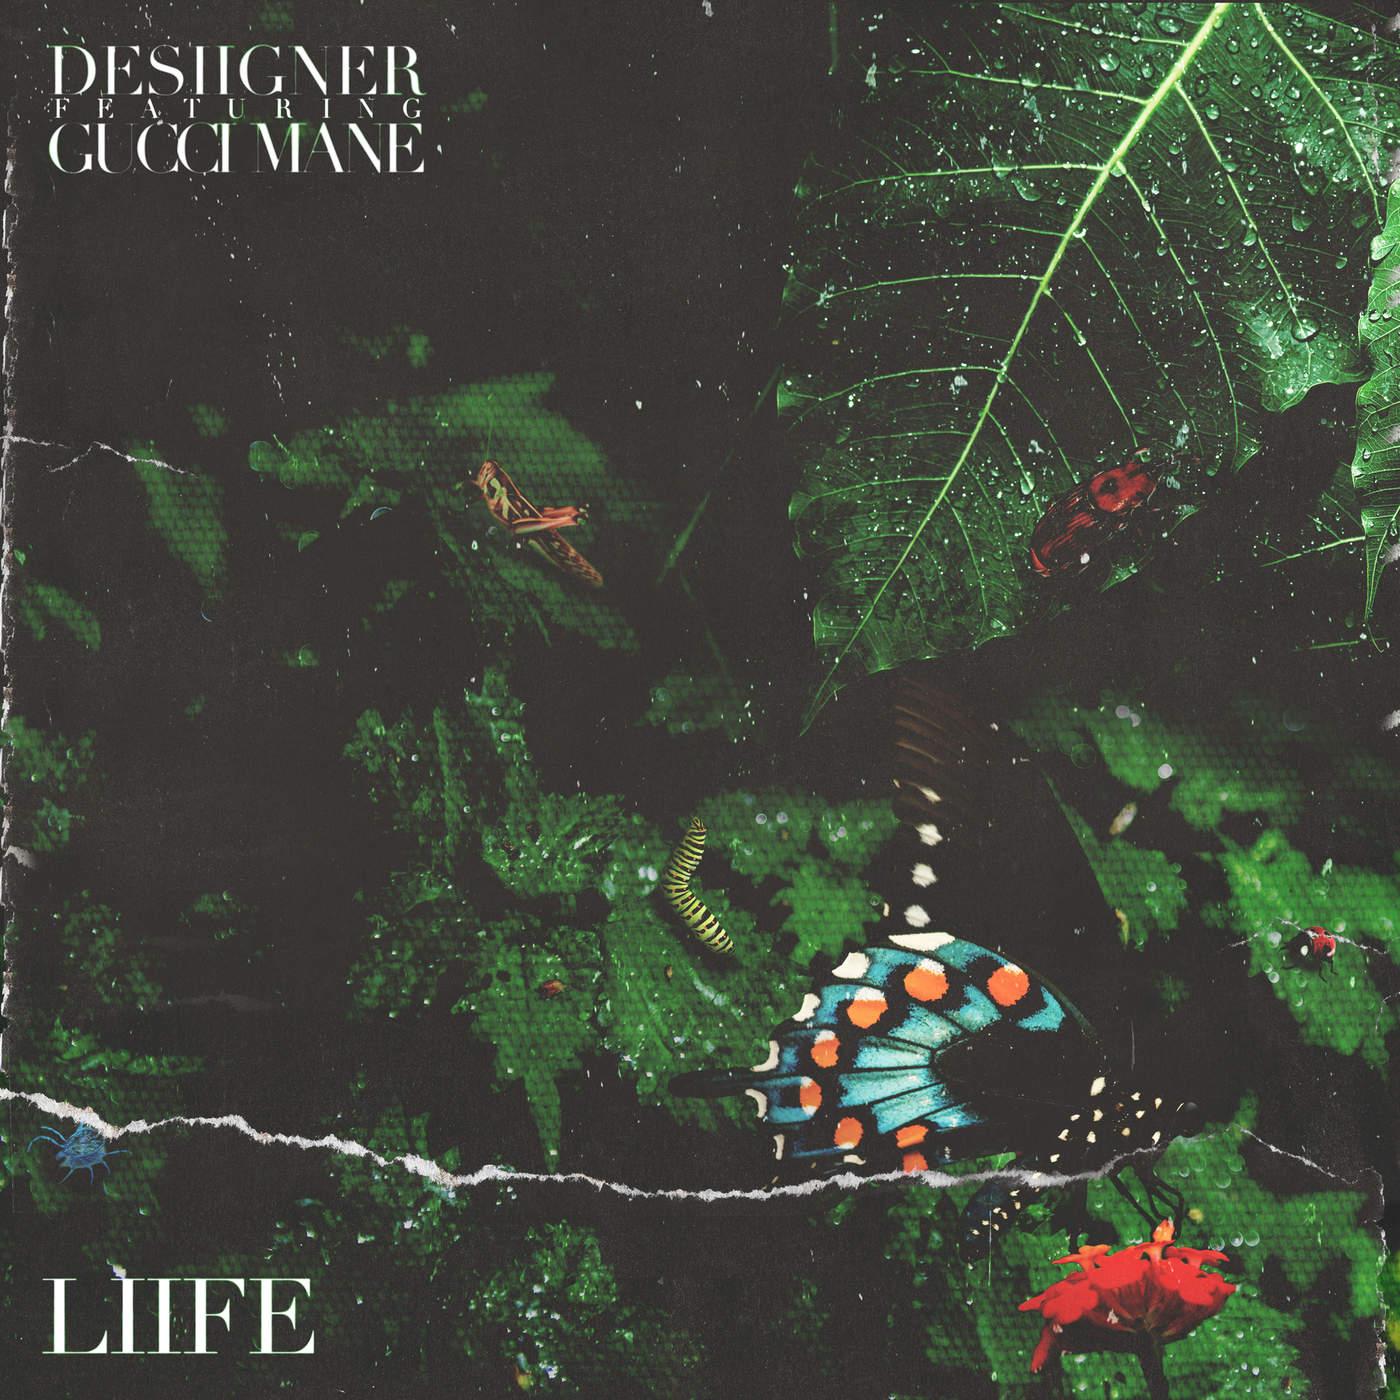 Desiigner - Liife (feat. Gucci Mane) - Single Cover